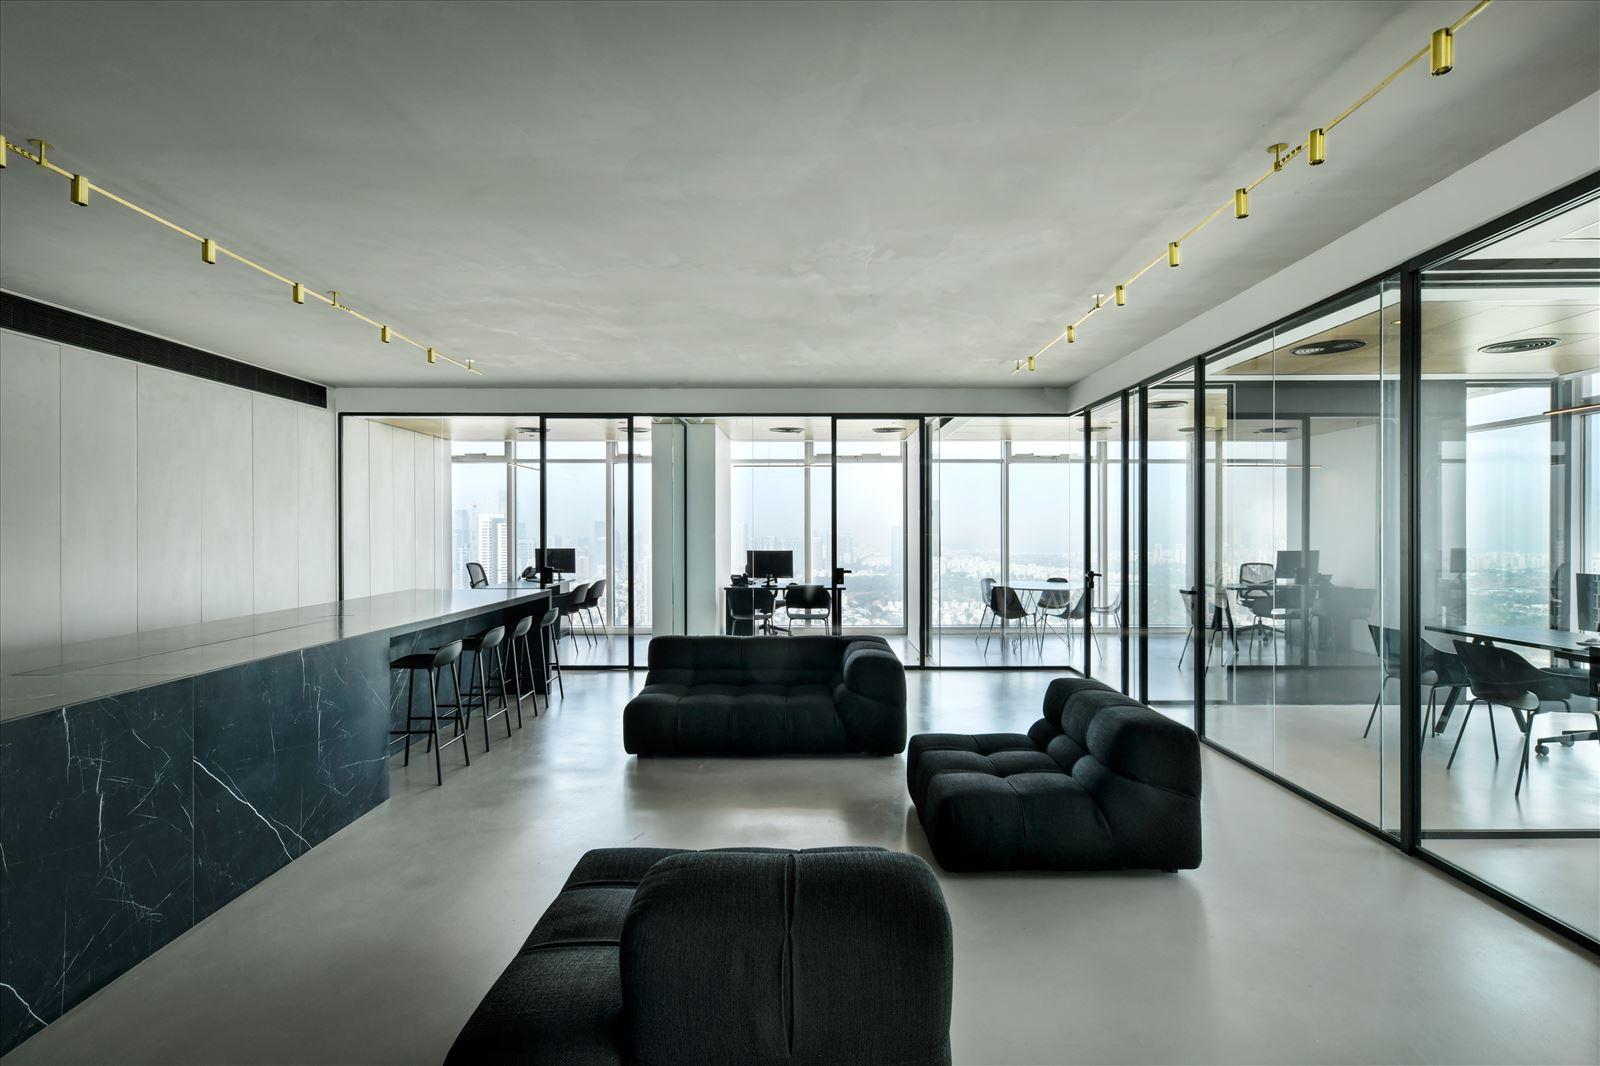 Divident office תכנון מיוחד של גופי תאורה מעל פינת הישיבה בעיצובו של קמחי תאורה